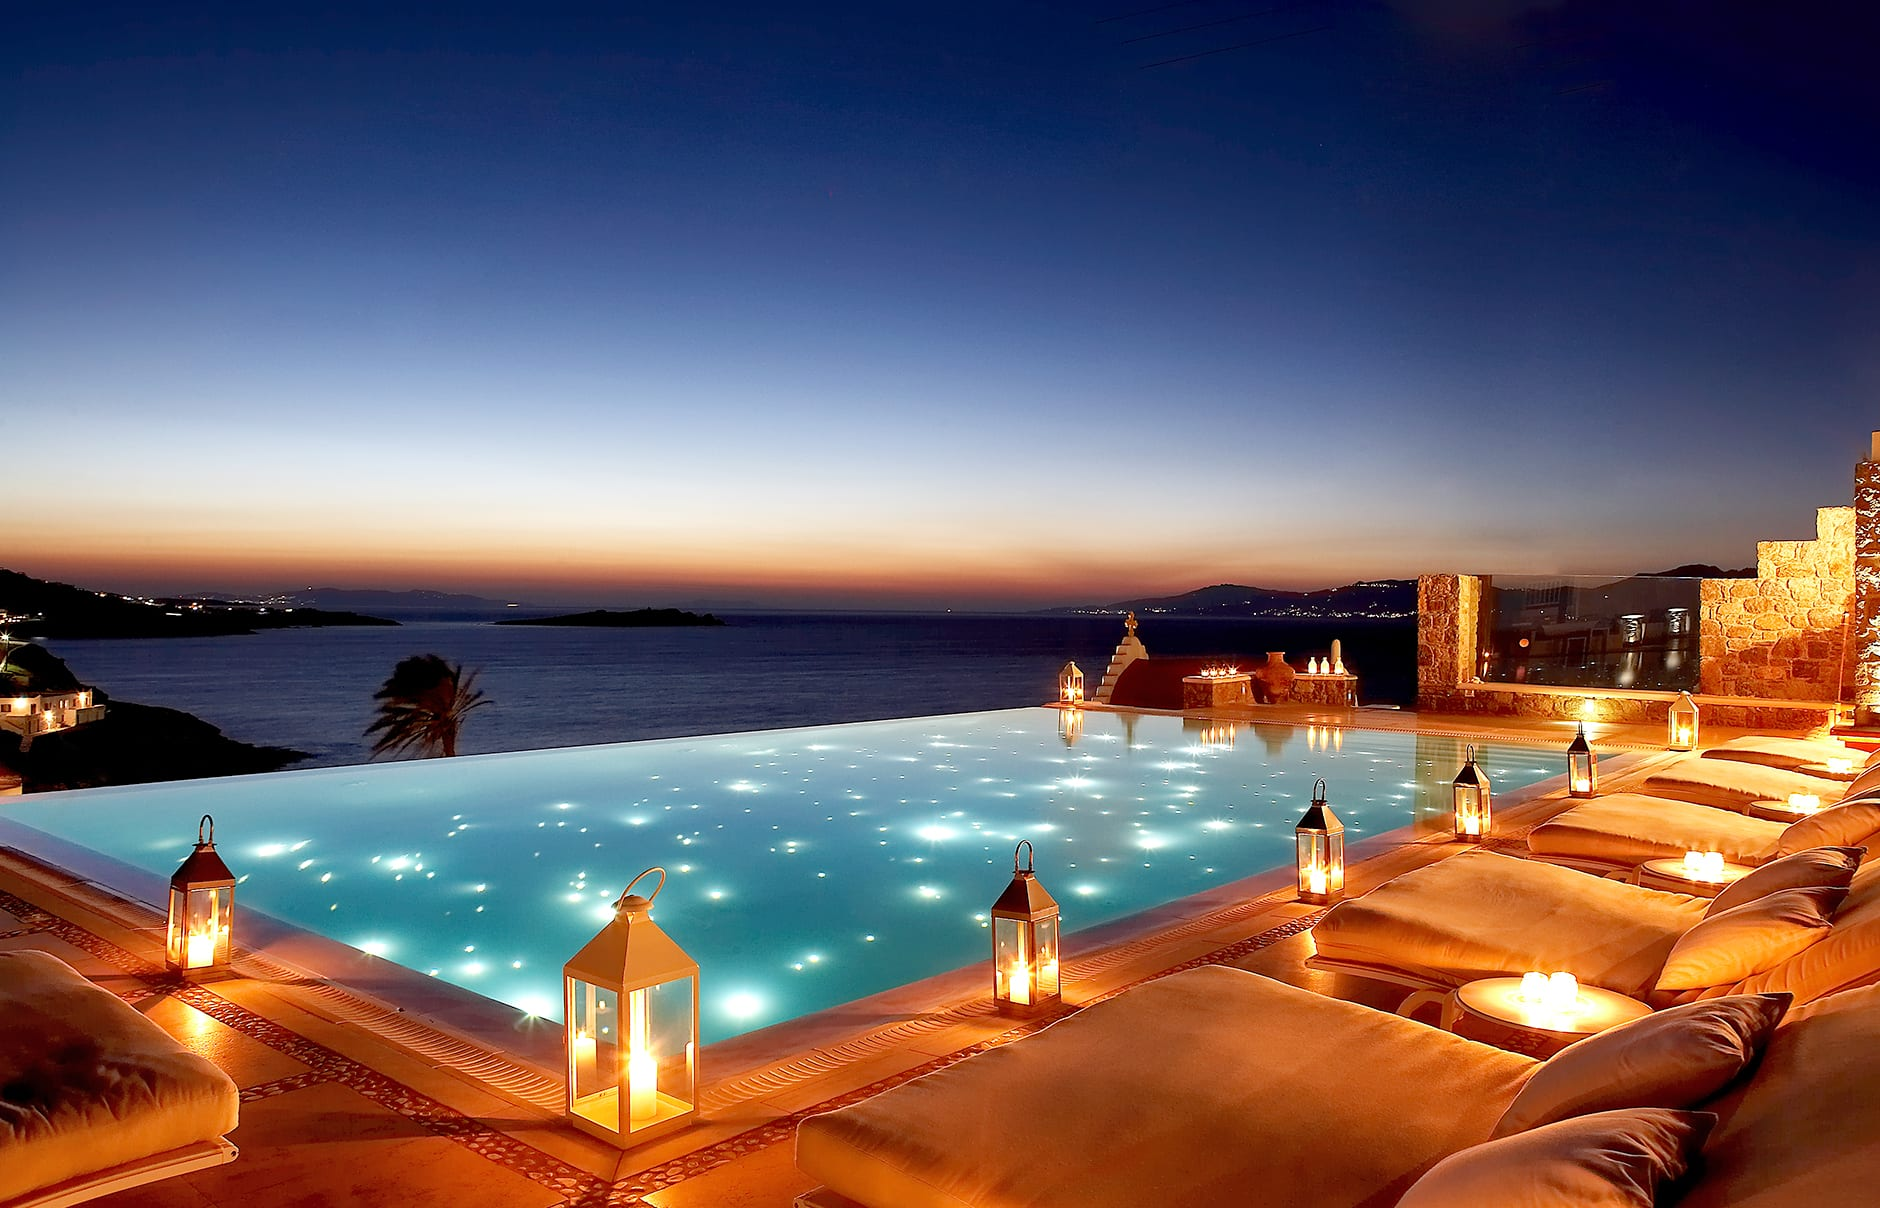 Infinity Pool. Bill & Coo Mykonos. © Bill & Coo Mykonos